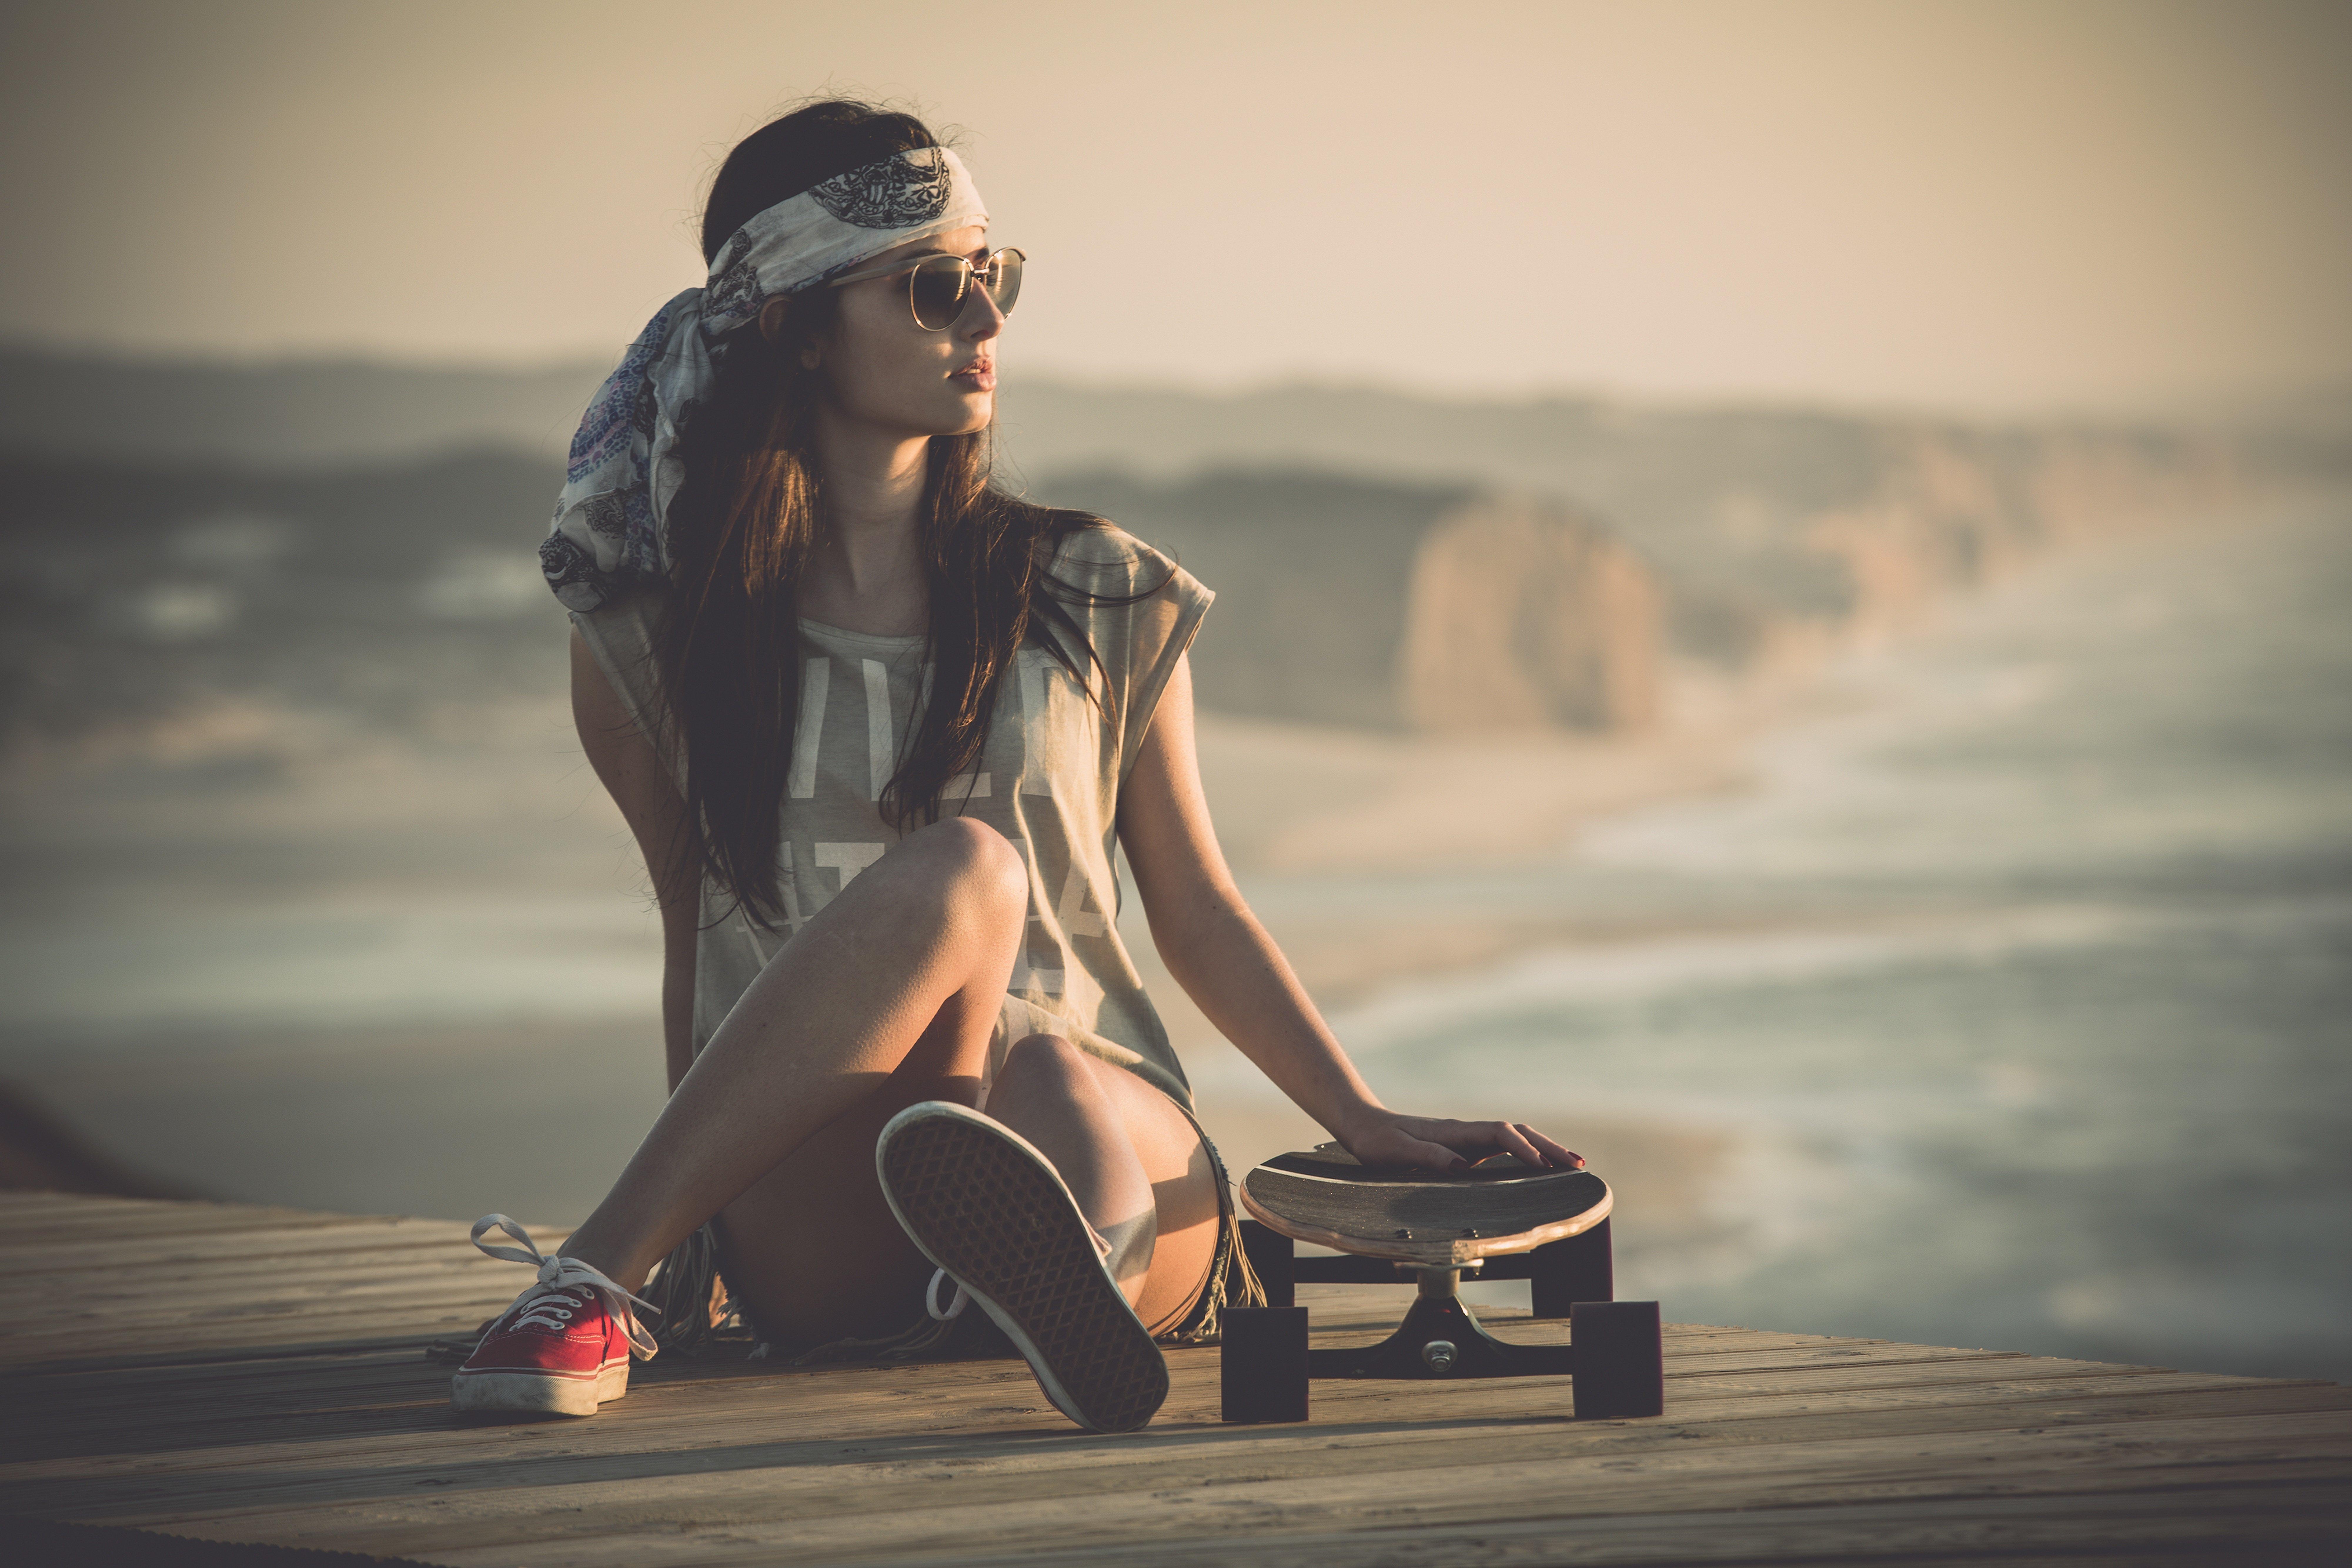 girl with skateboard 1575664751 - Girl With Skateboard -